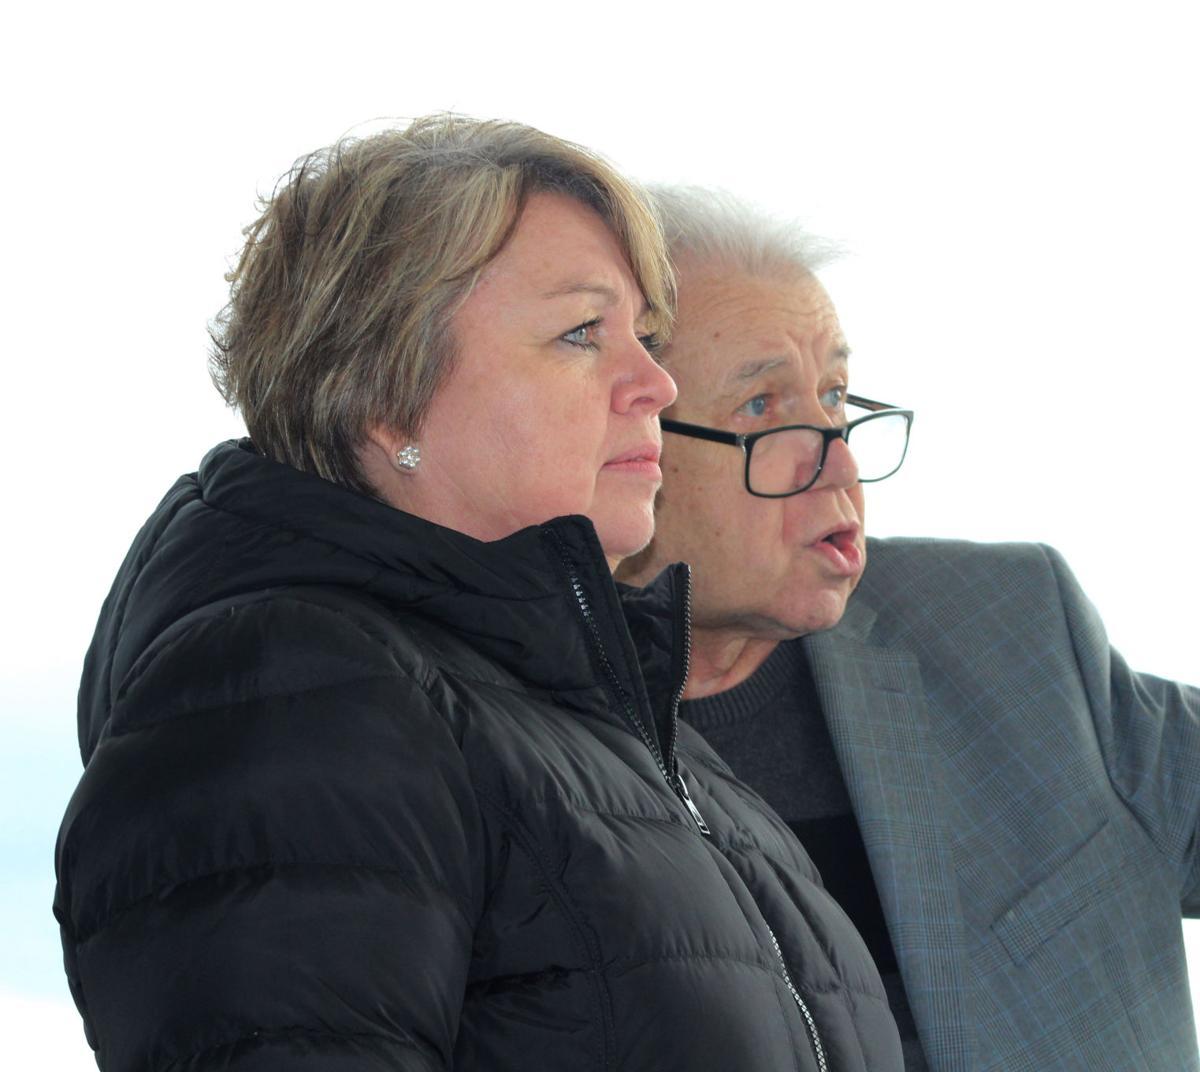 Woodward, Ritchie